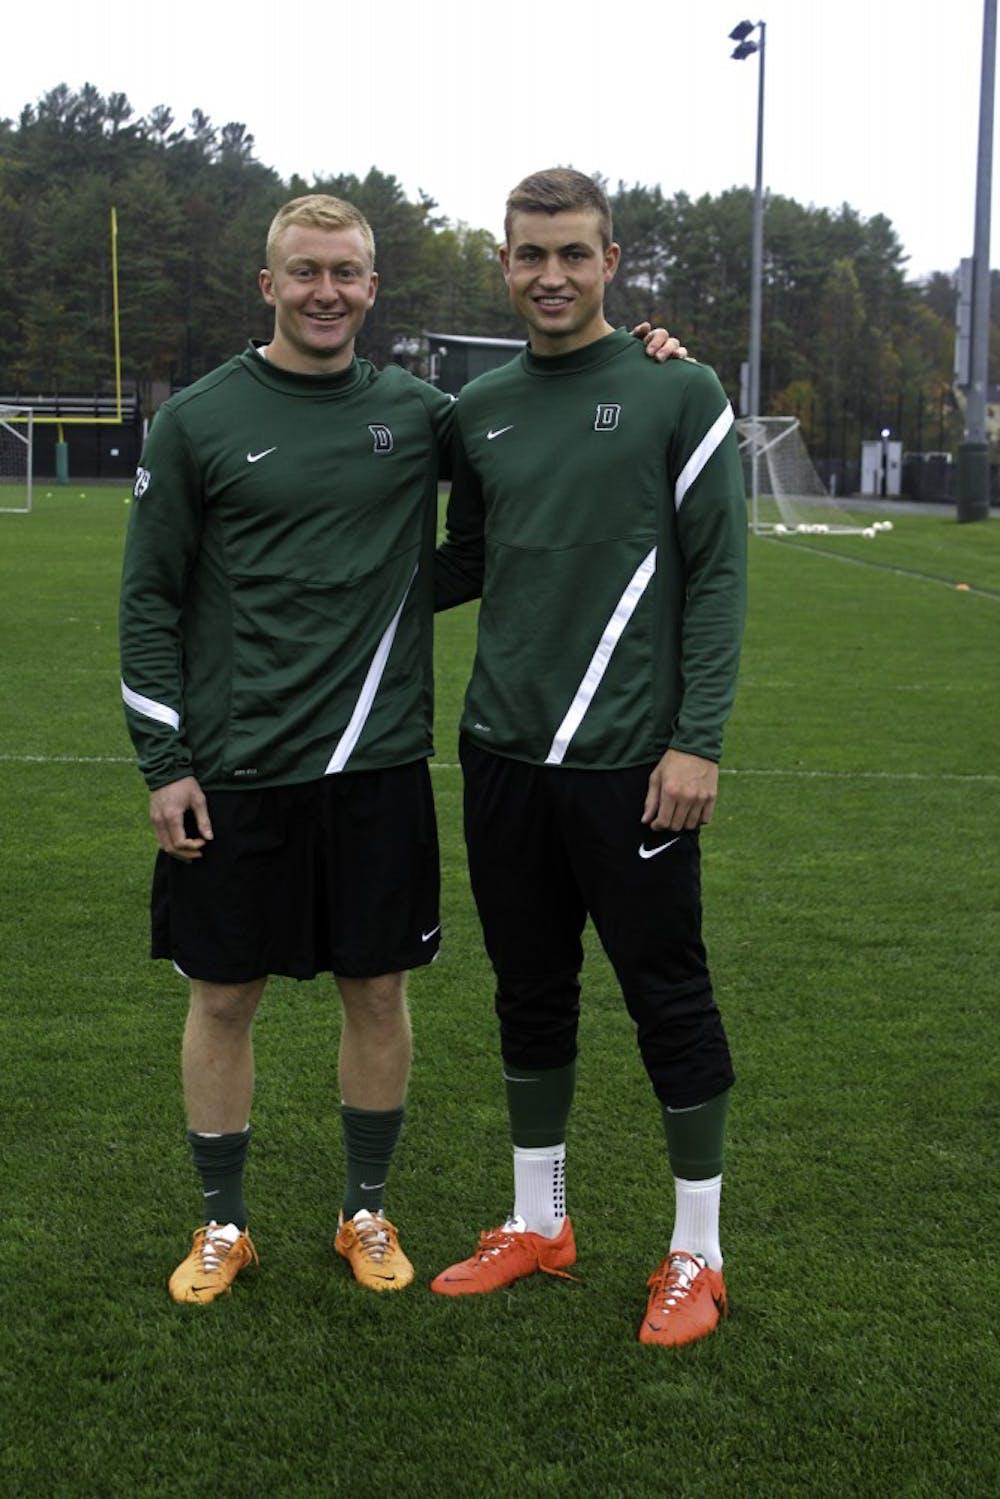 10-22-14-sports-danilack-brothers-natalie-cantave